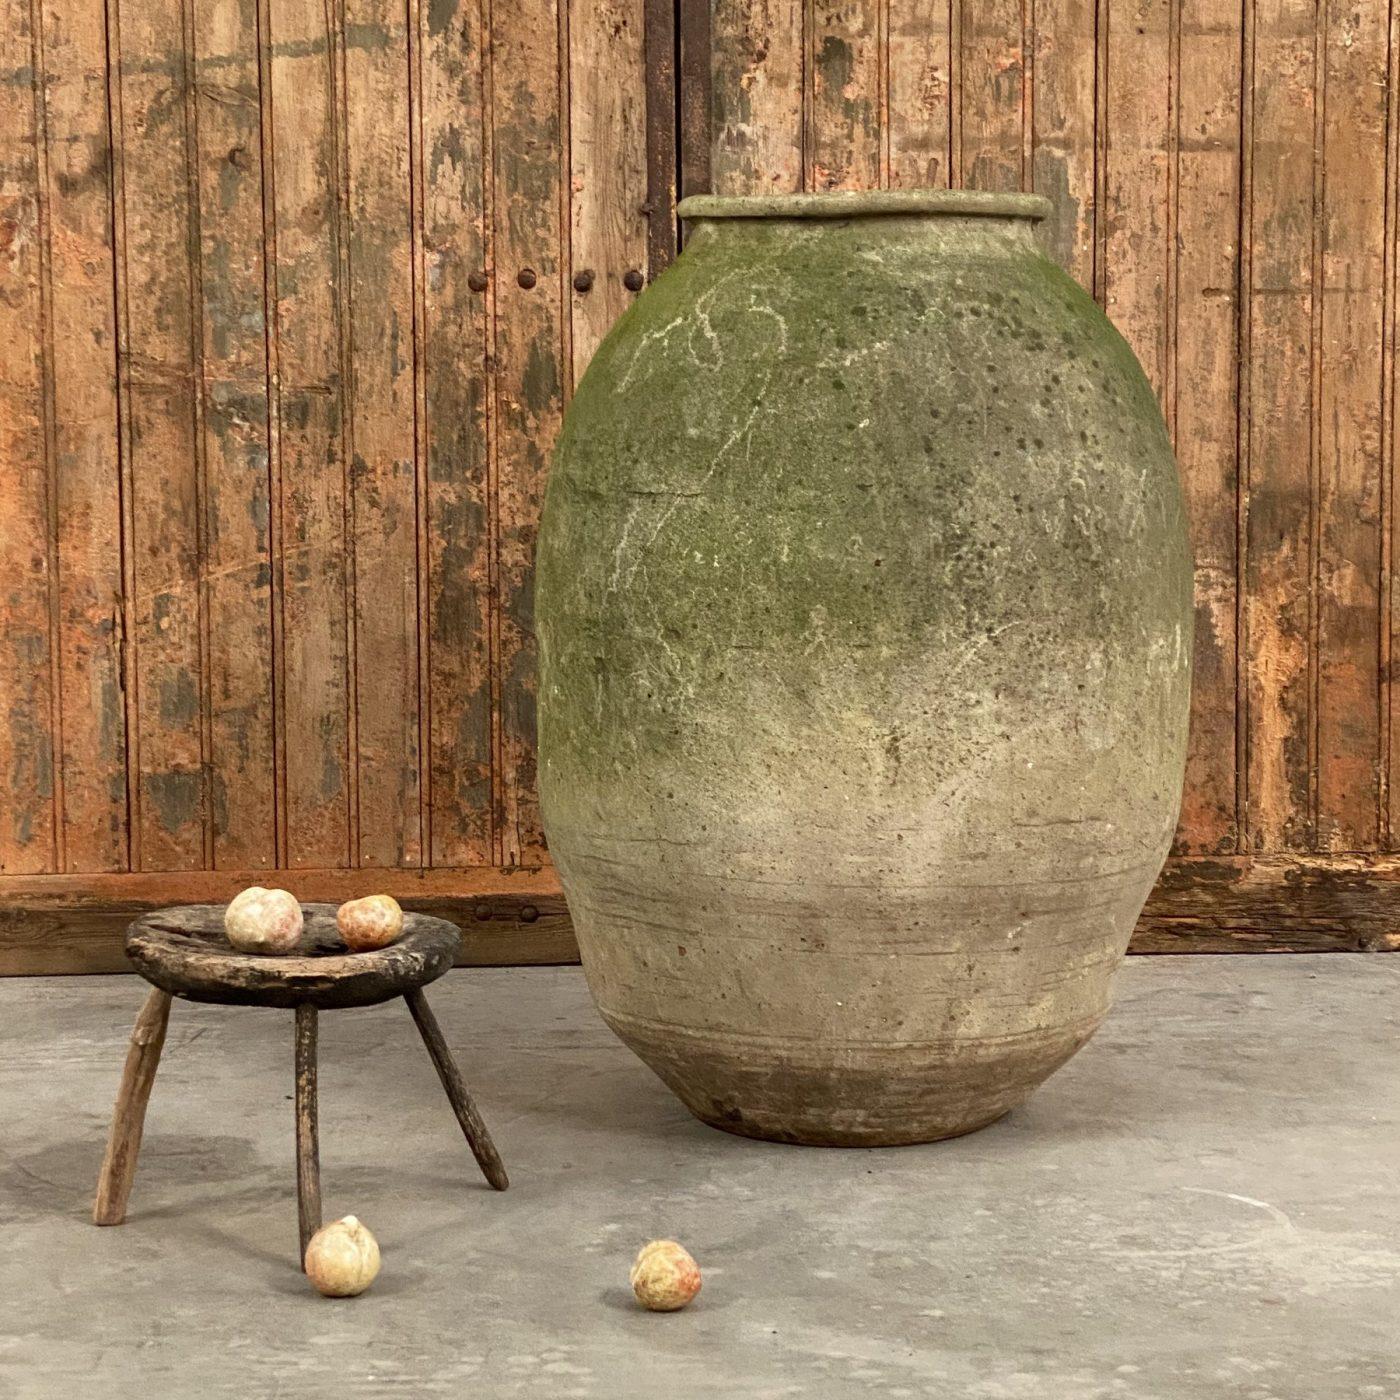 objet-vagabond-terracotta-jar0002